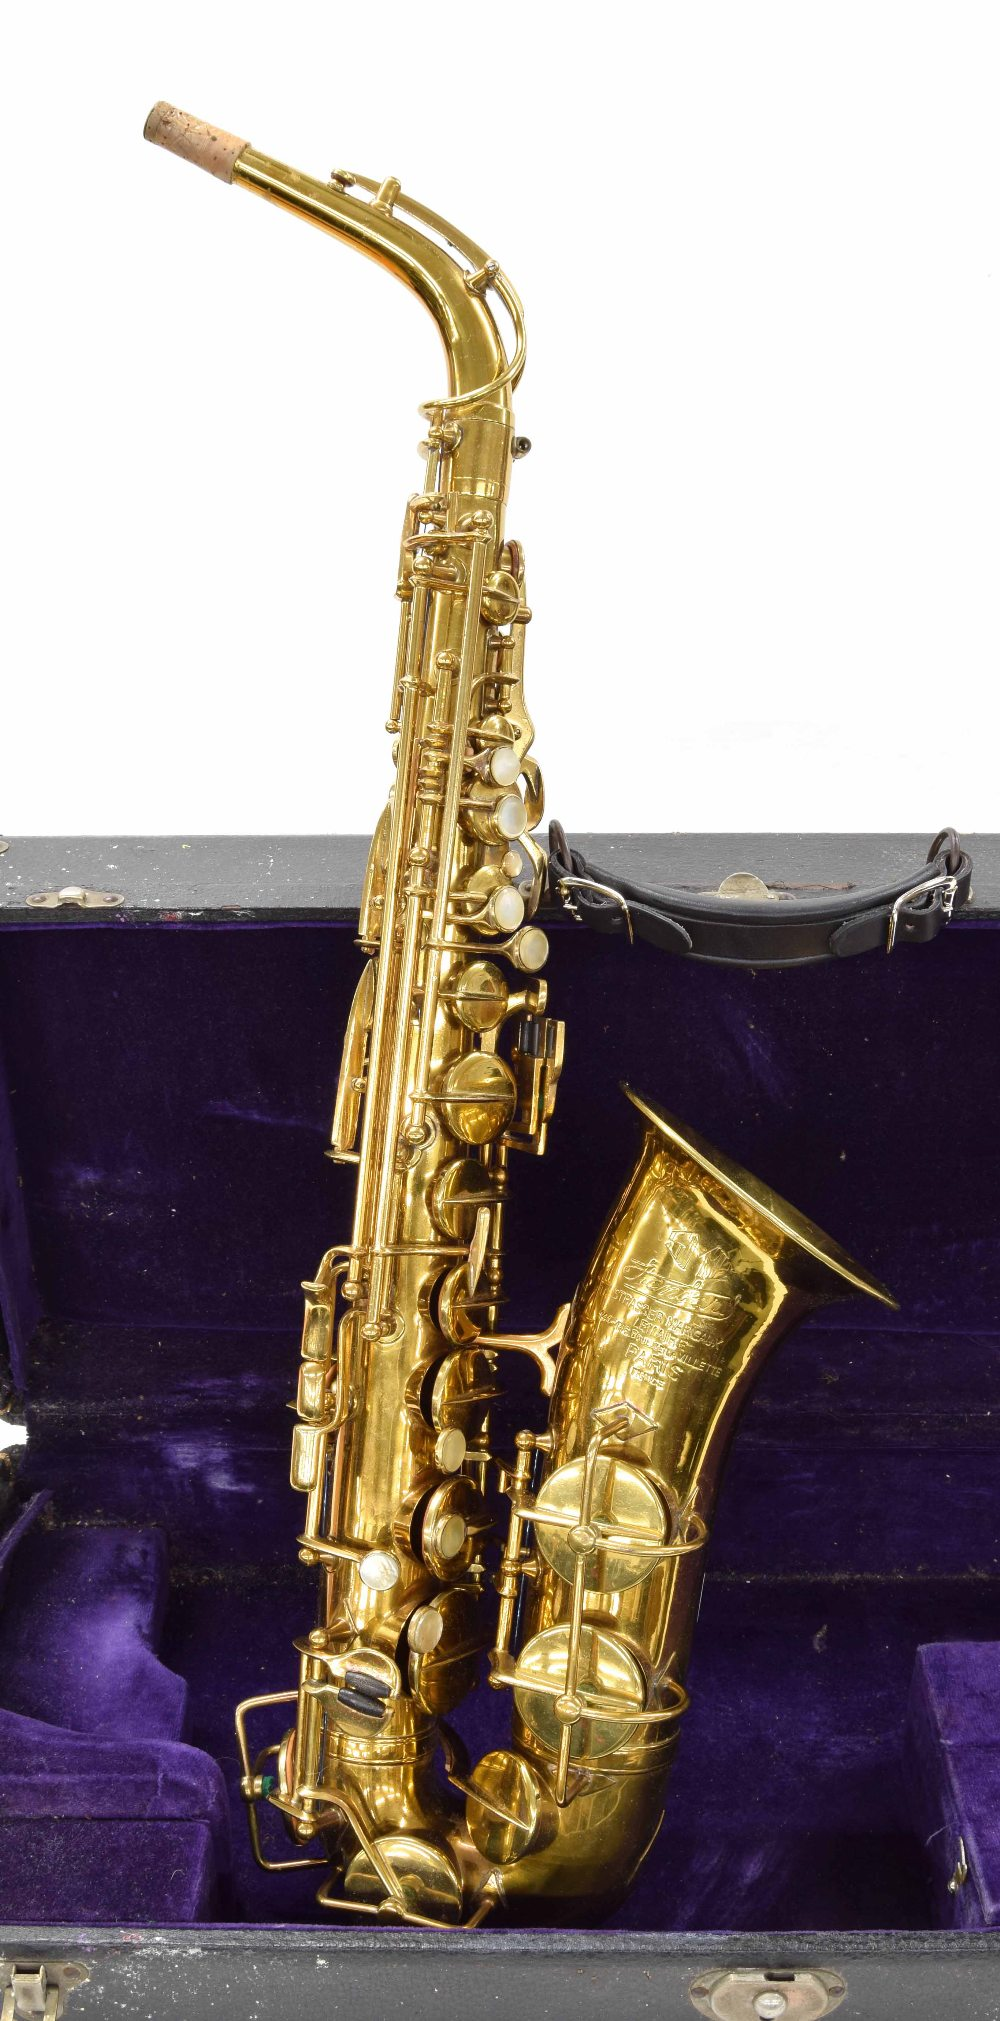 Lot 867 - Strasser Marigaux standard gold lacquered alto saxophone, no. 7630, case